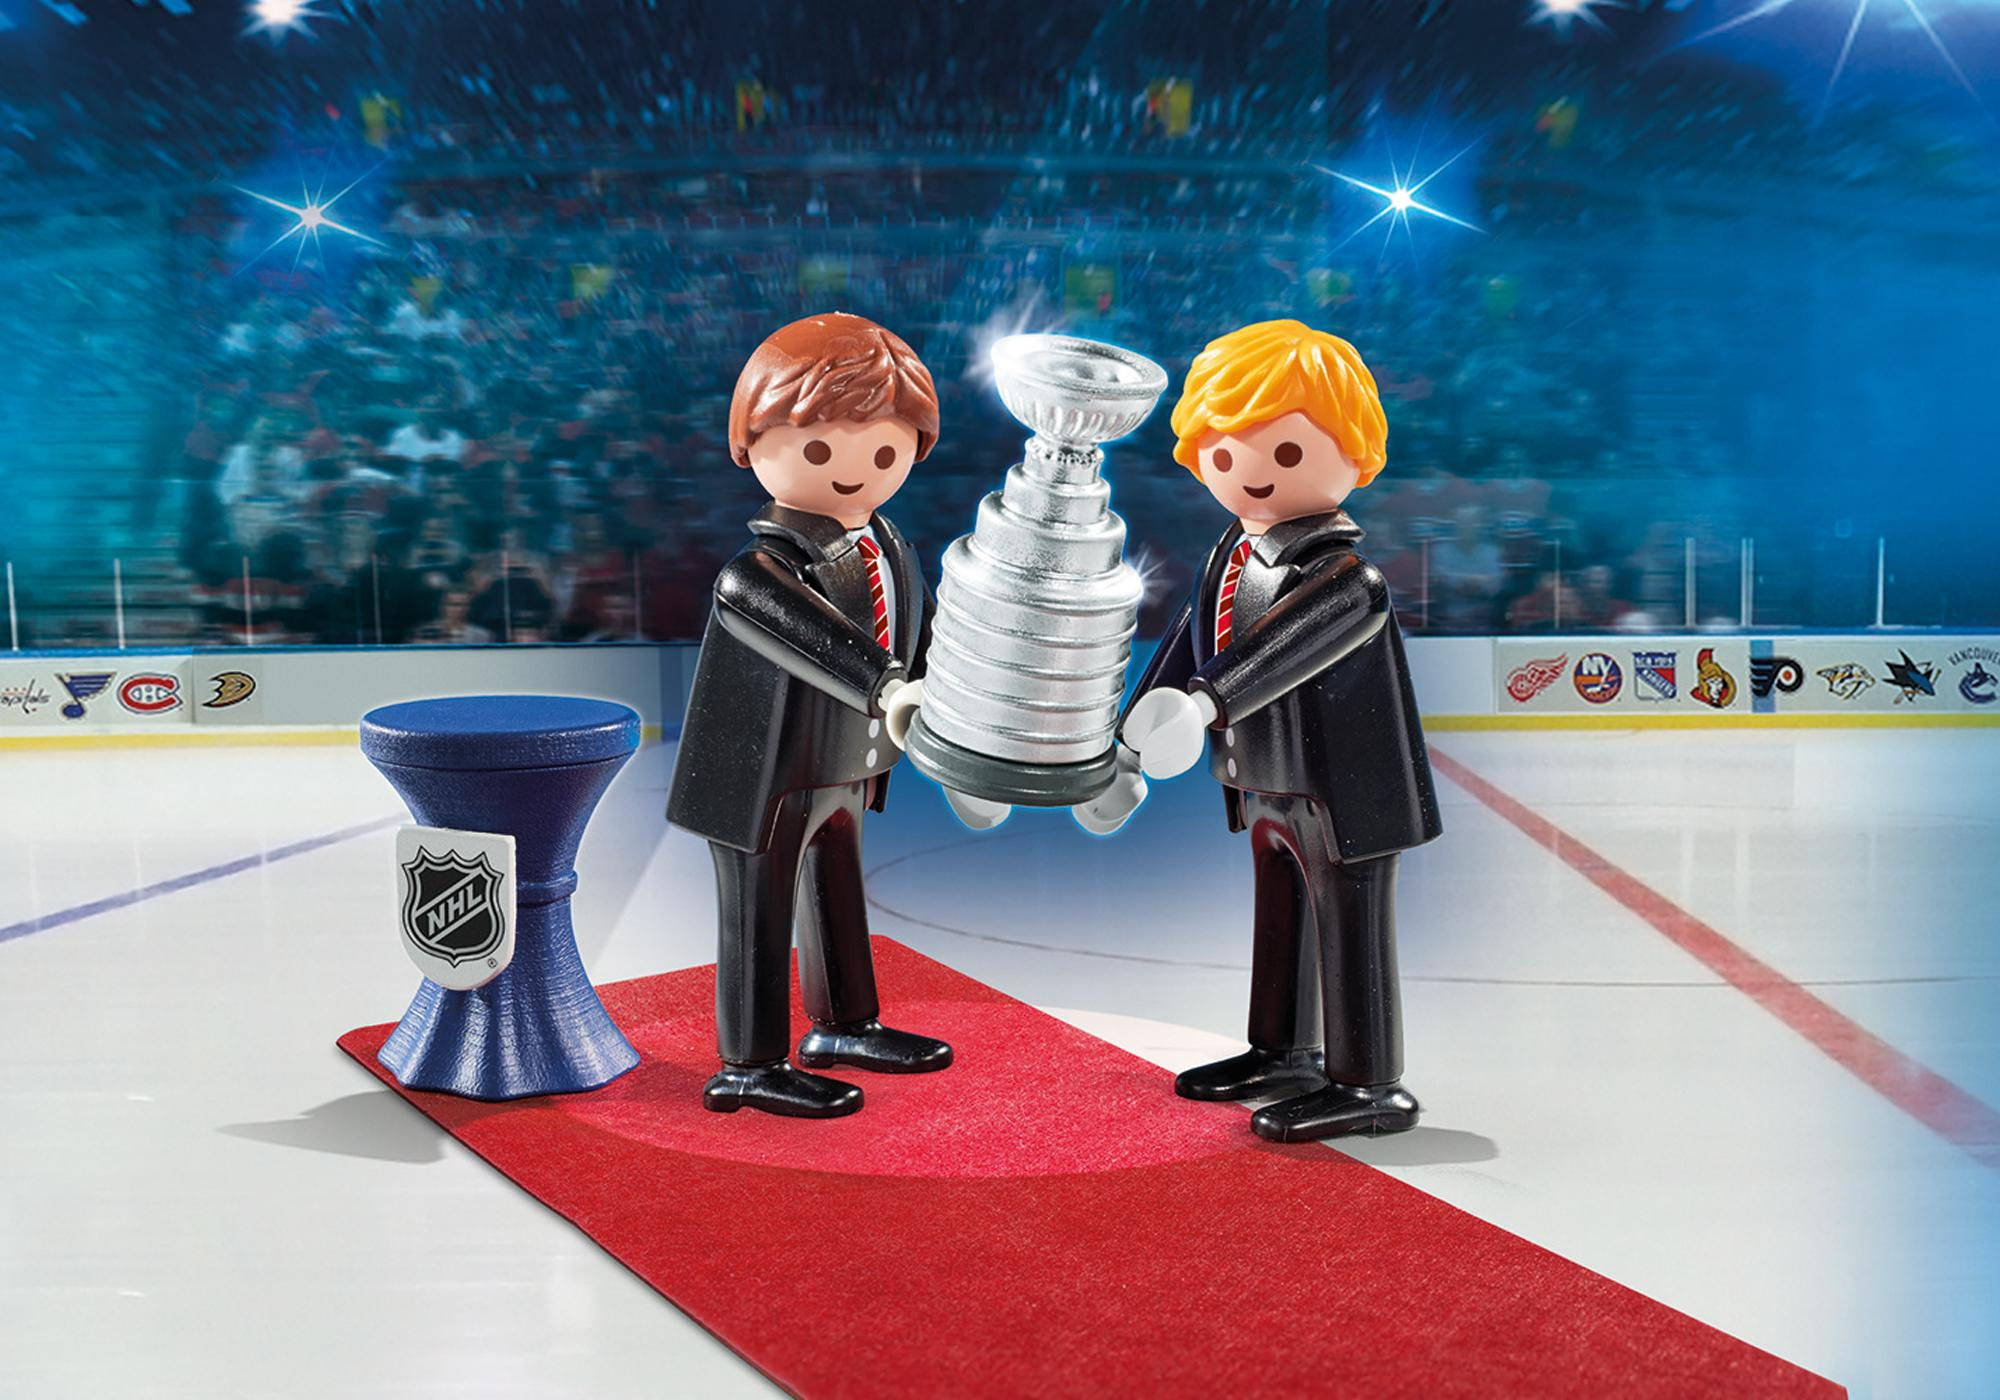 http://media.playmobil.com/i/playmobil/9015_product_detail/NHL® Stanley Cup® presentation set